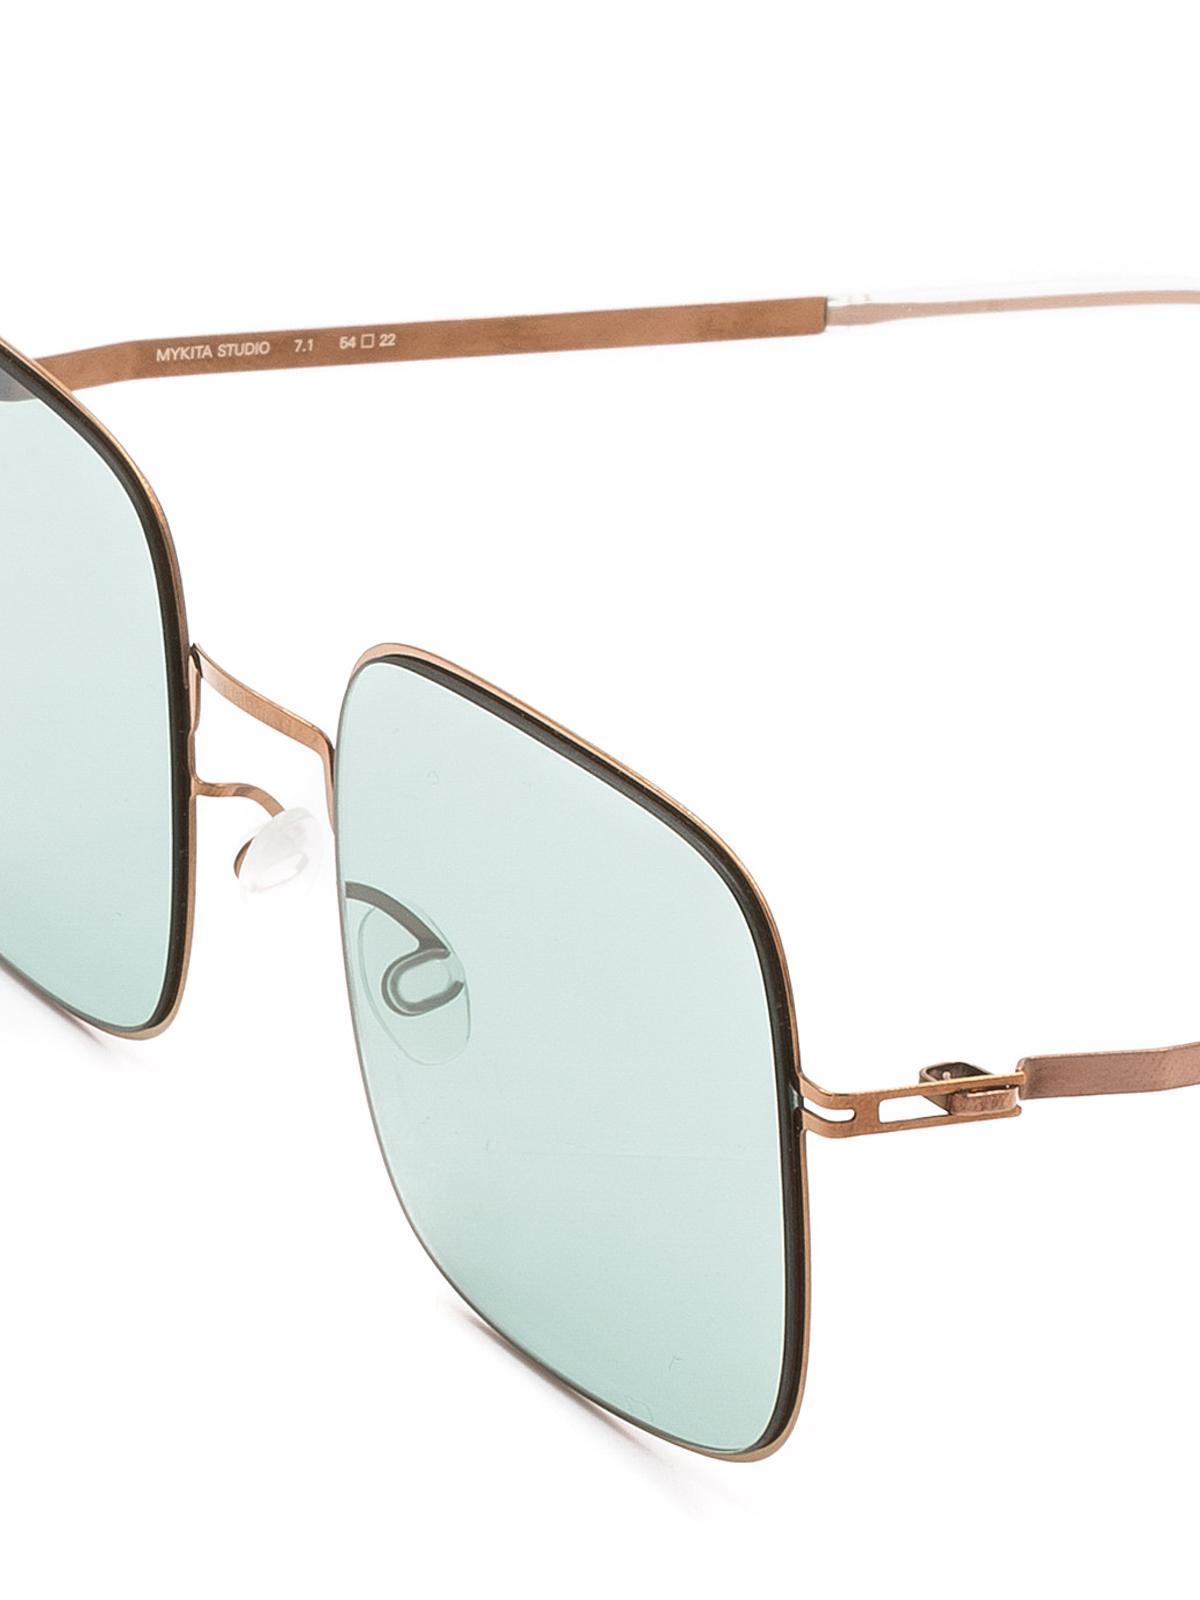 c52ba888c18 Mykita - Studio 7.1 square-shaped sunglasses - sunglasses - STUDIO71252